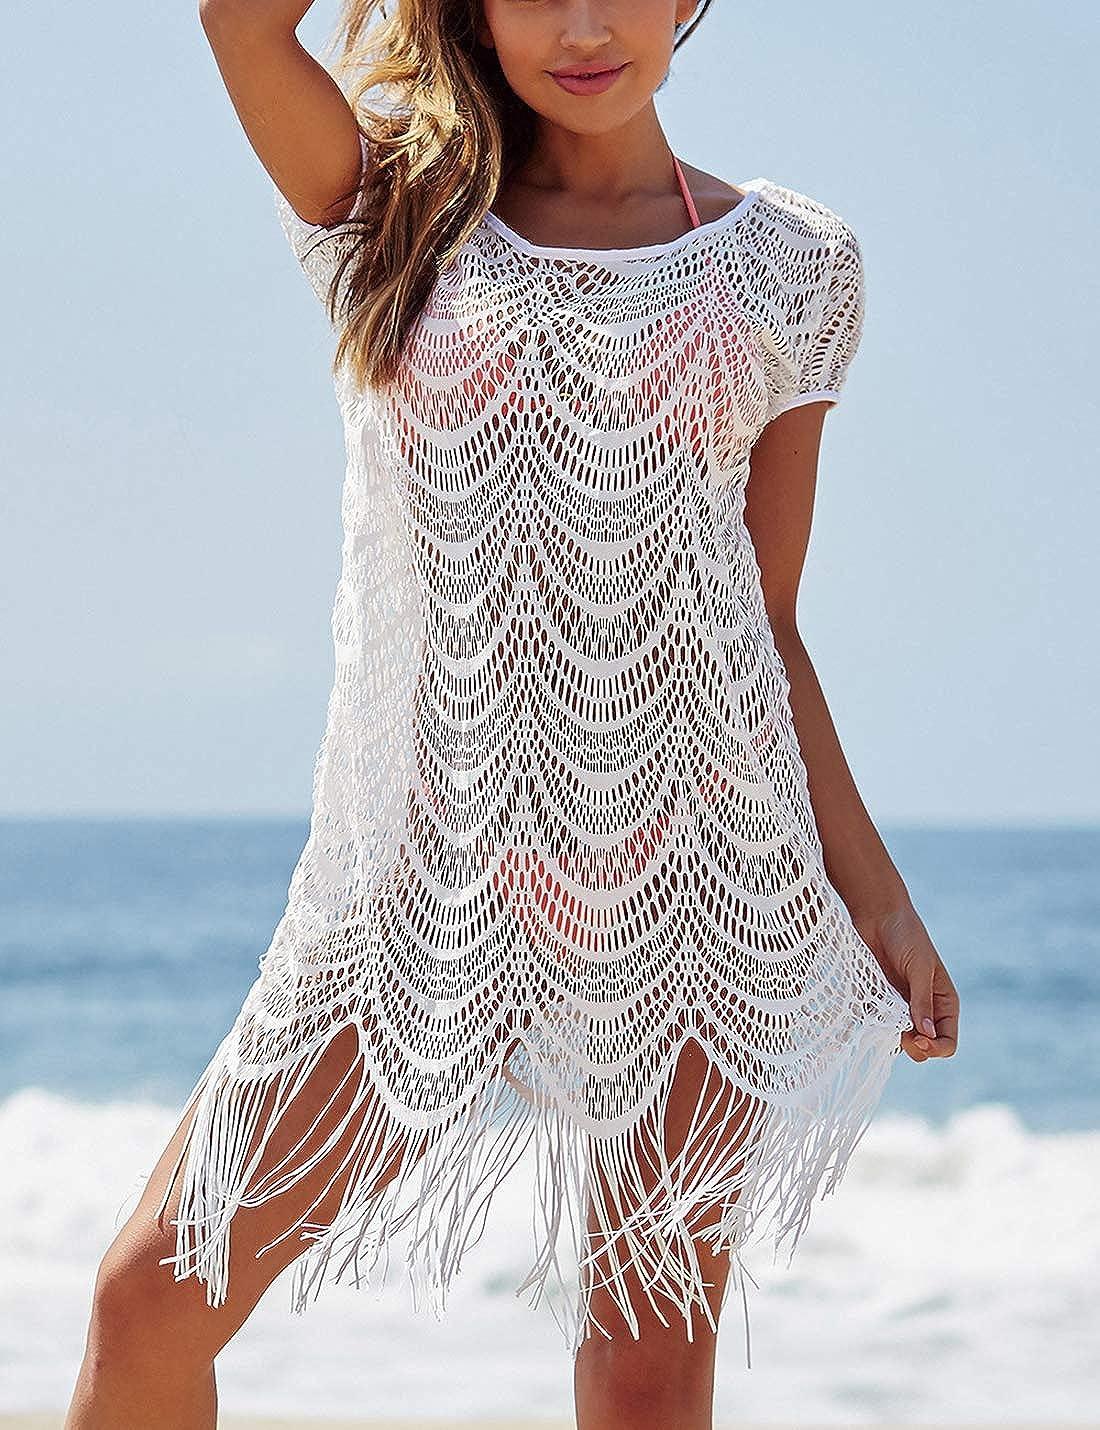 f2d1796623 Ailunsnika White V Neck Short Sleeve Bikini Cover Up Dress Beach Tassel  Hollow Out Swimwear Cover Ups for Women at Amazon Women's Clothing store: